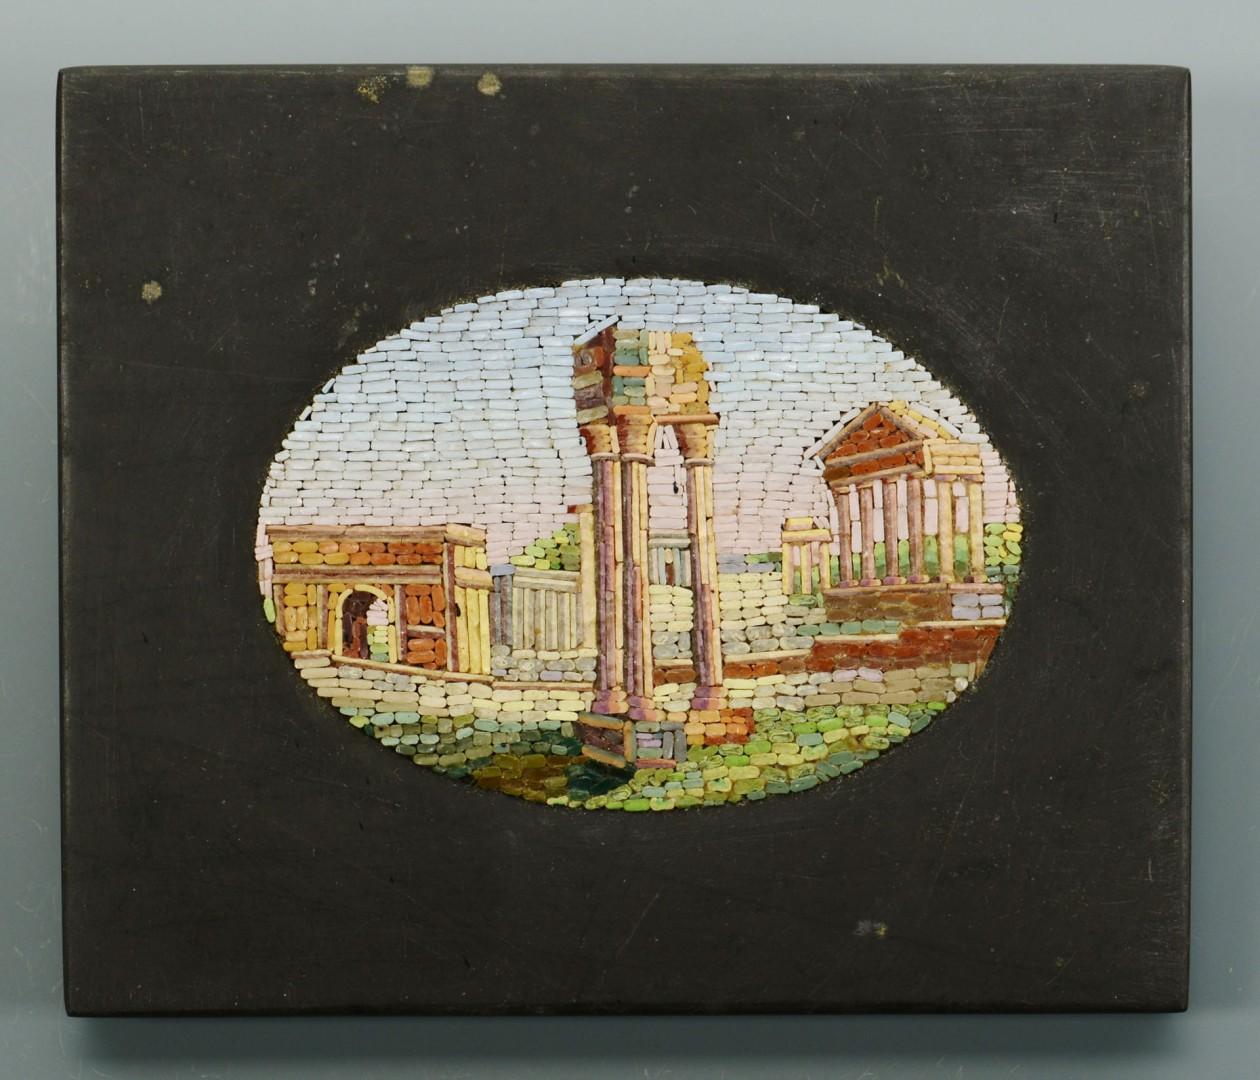 Micro Mosaic Miniature of Roman Ruins